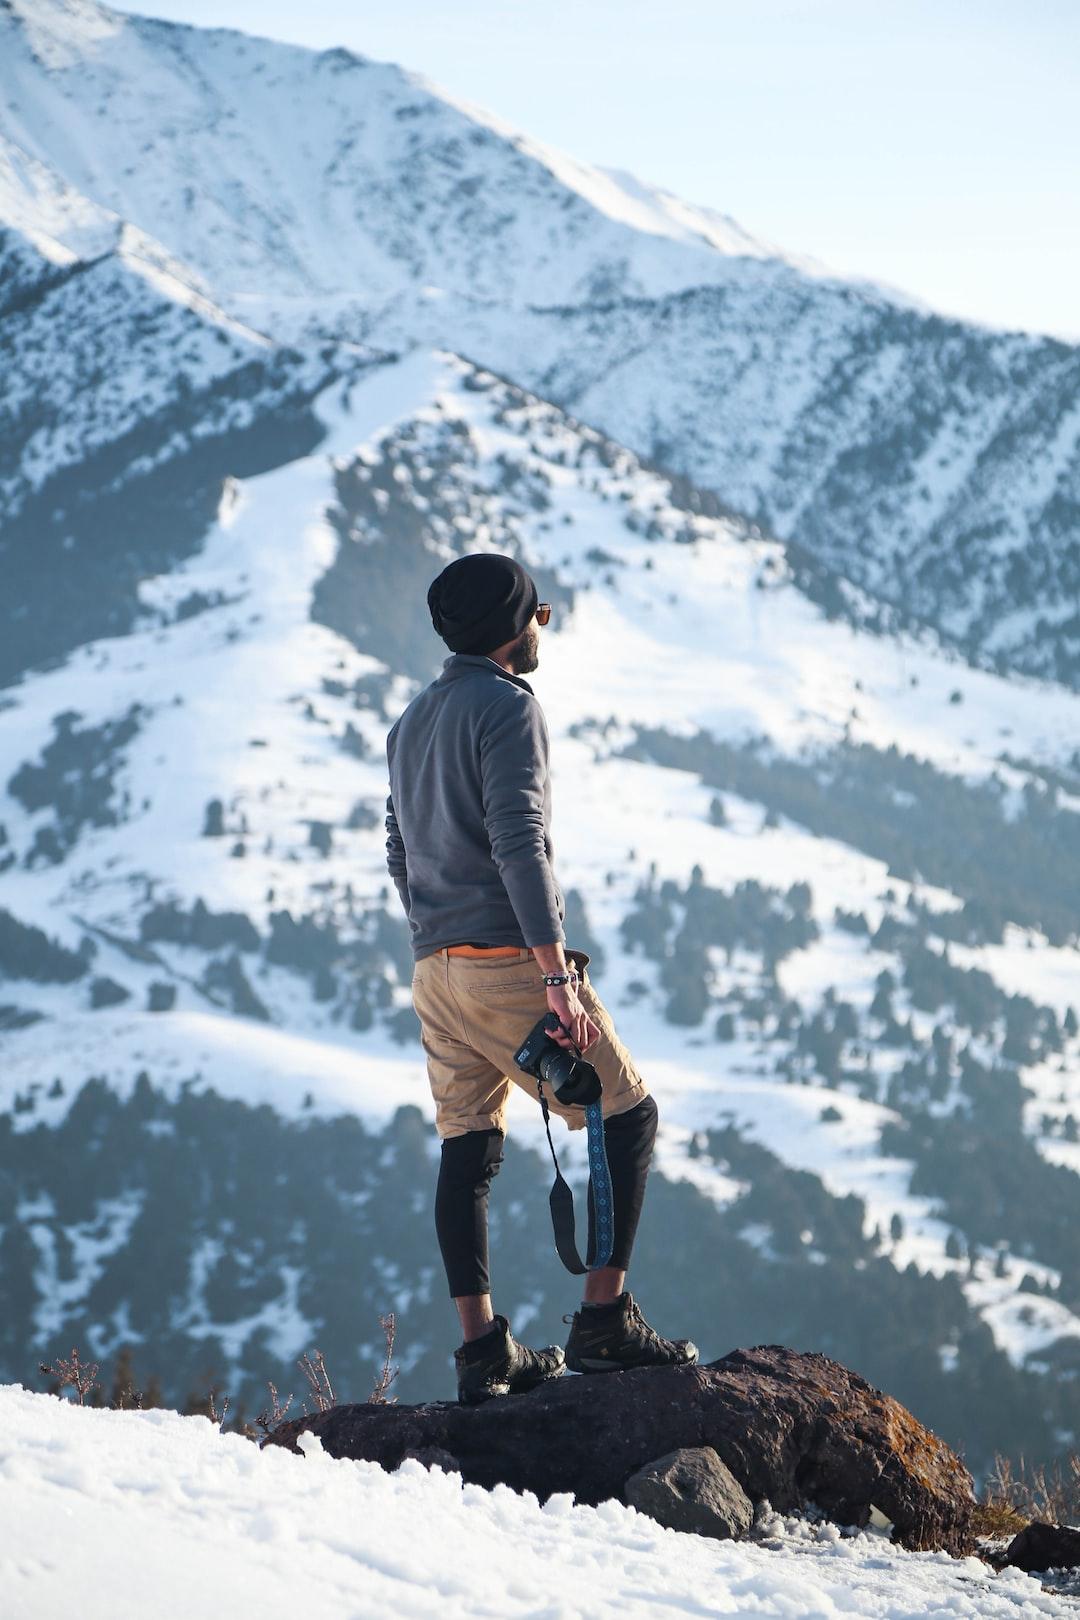 Exploring the mountains